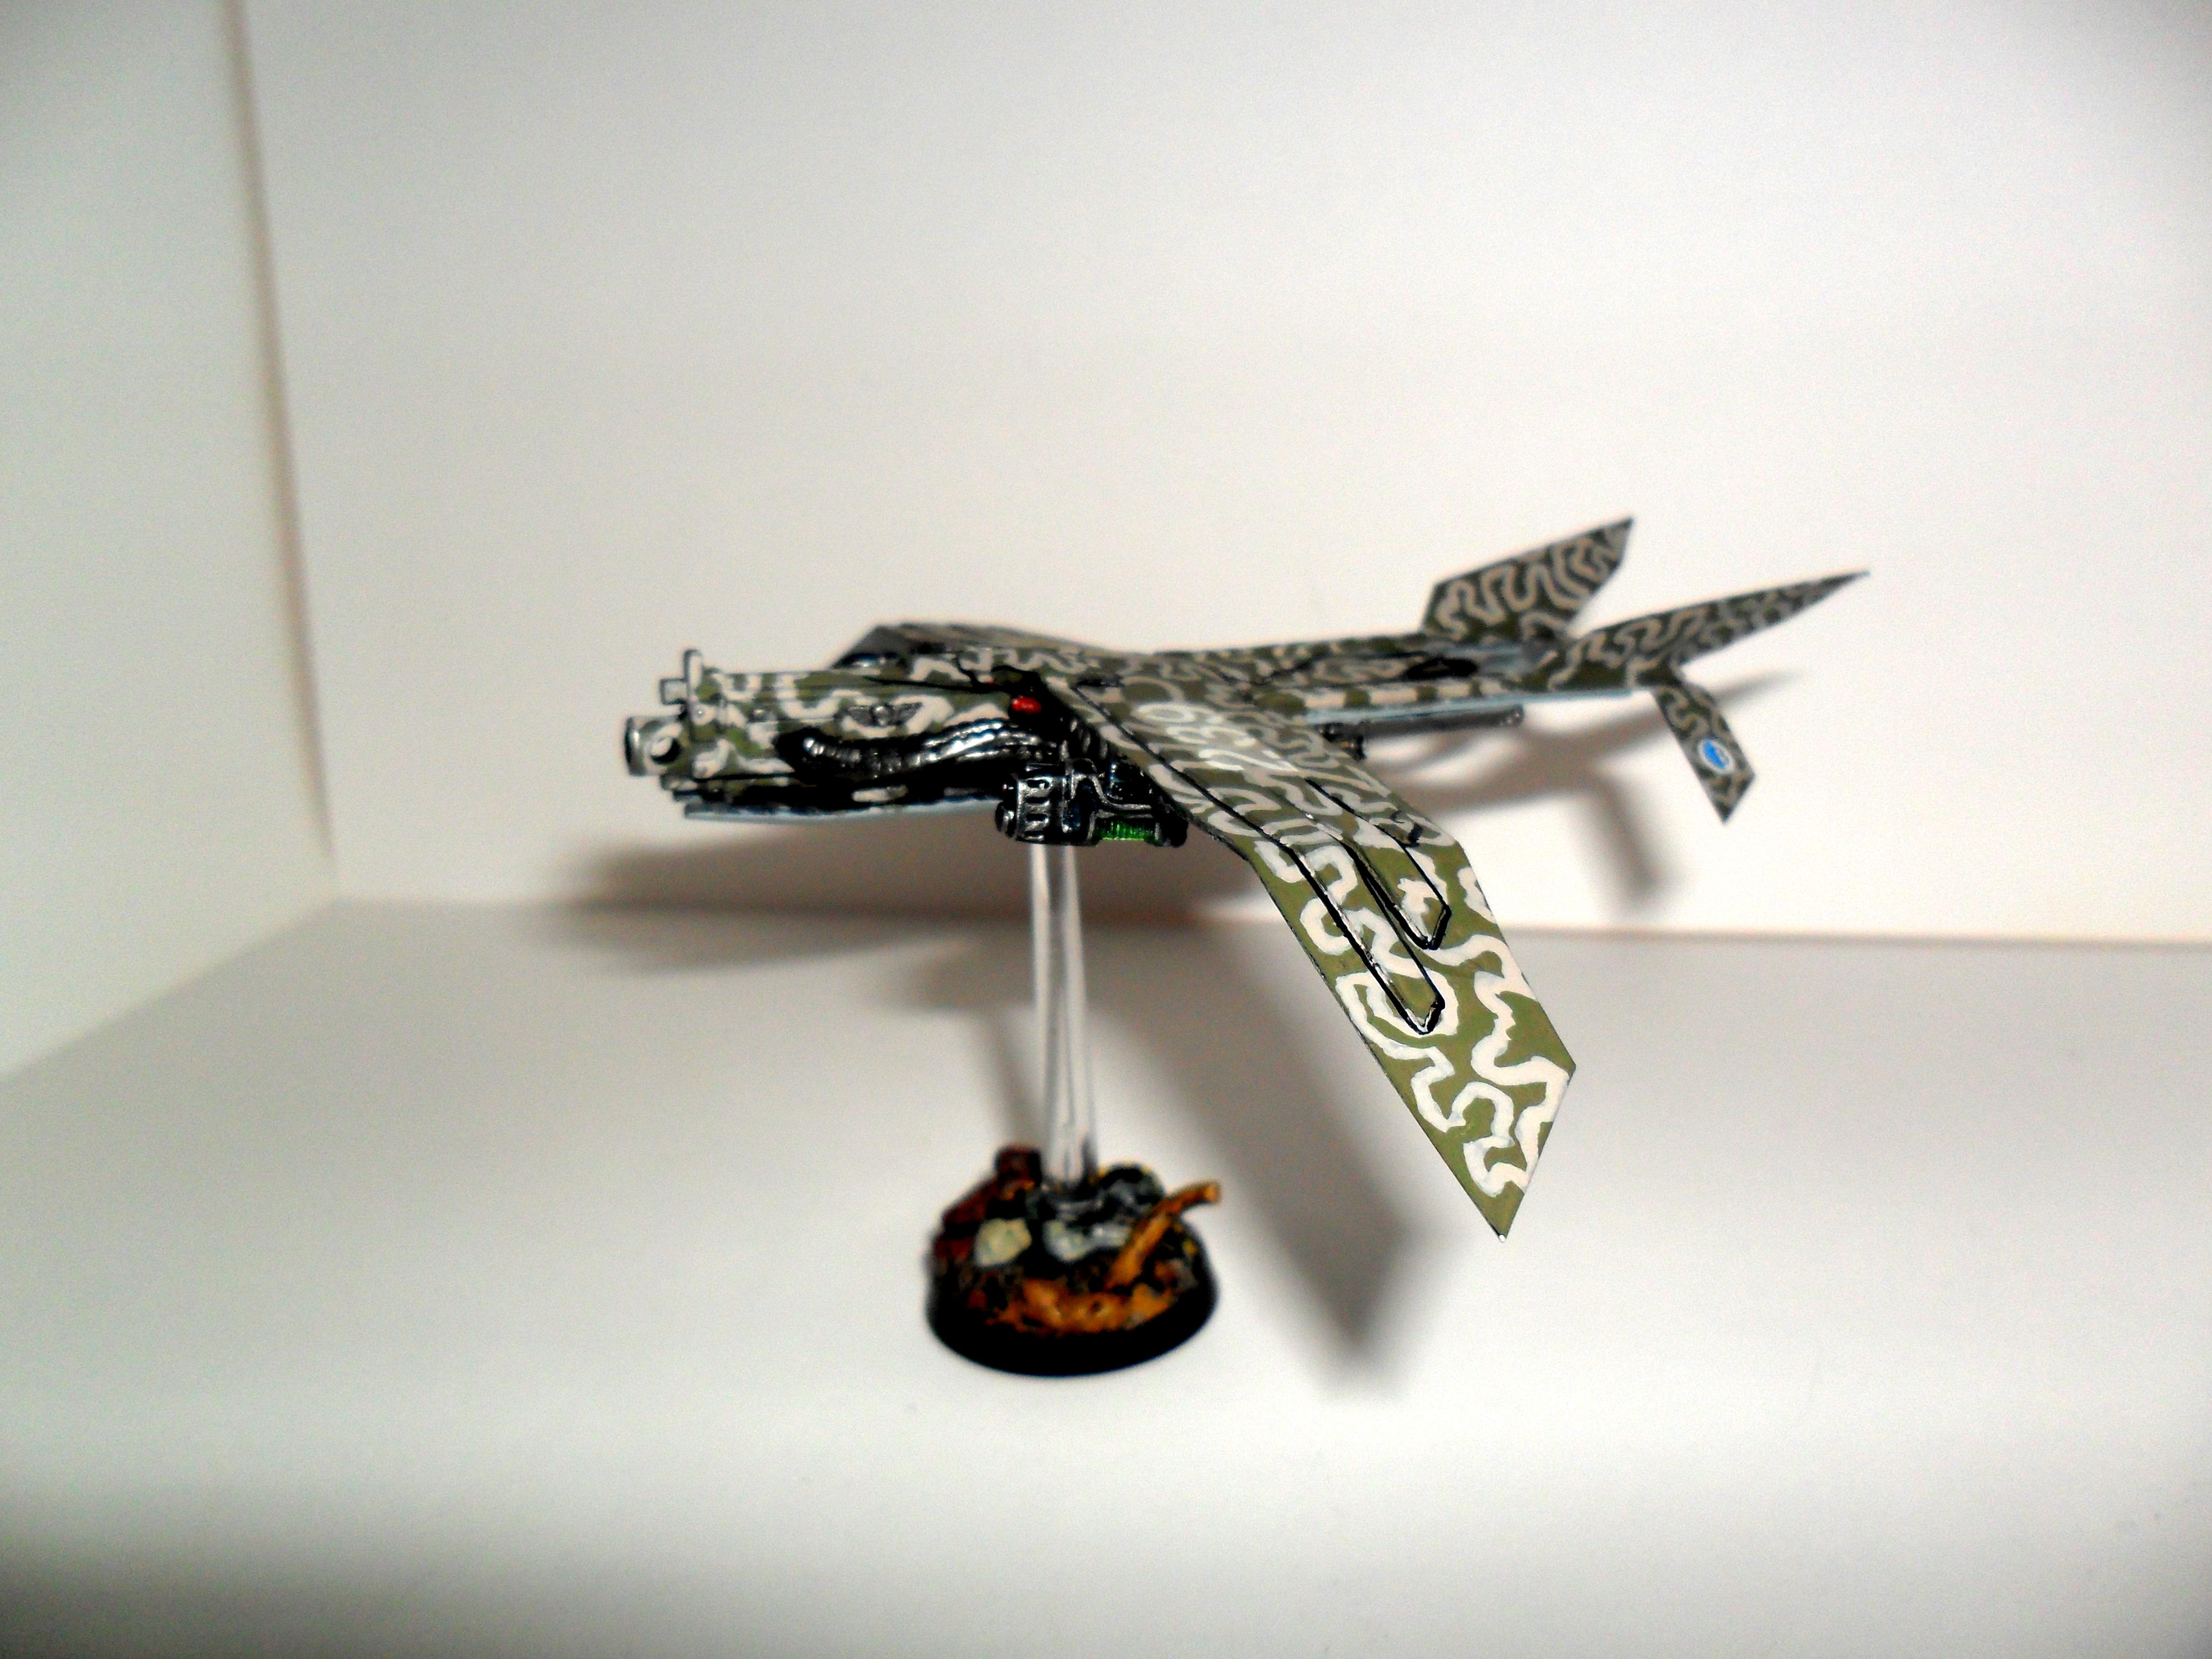 Imperial Guard, killer drone